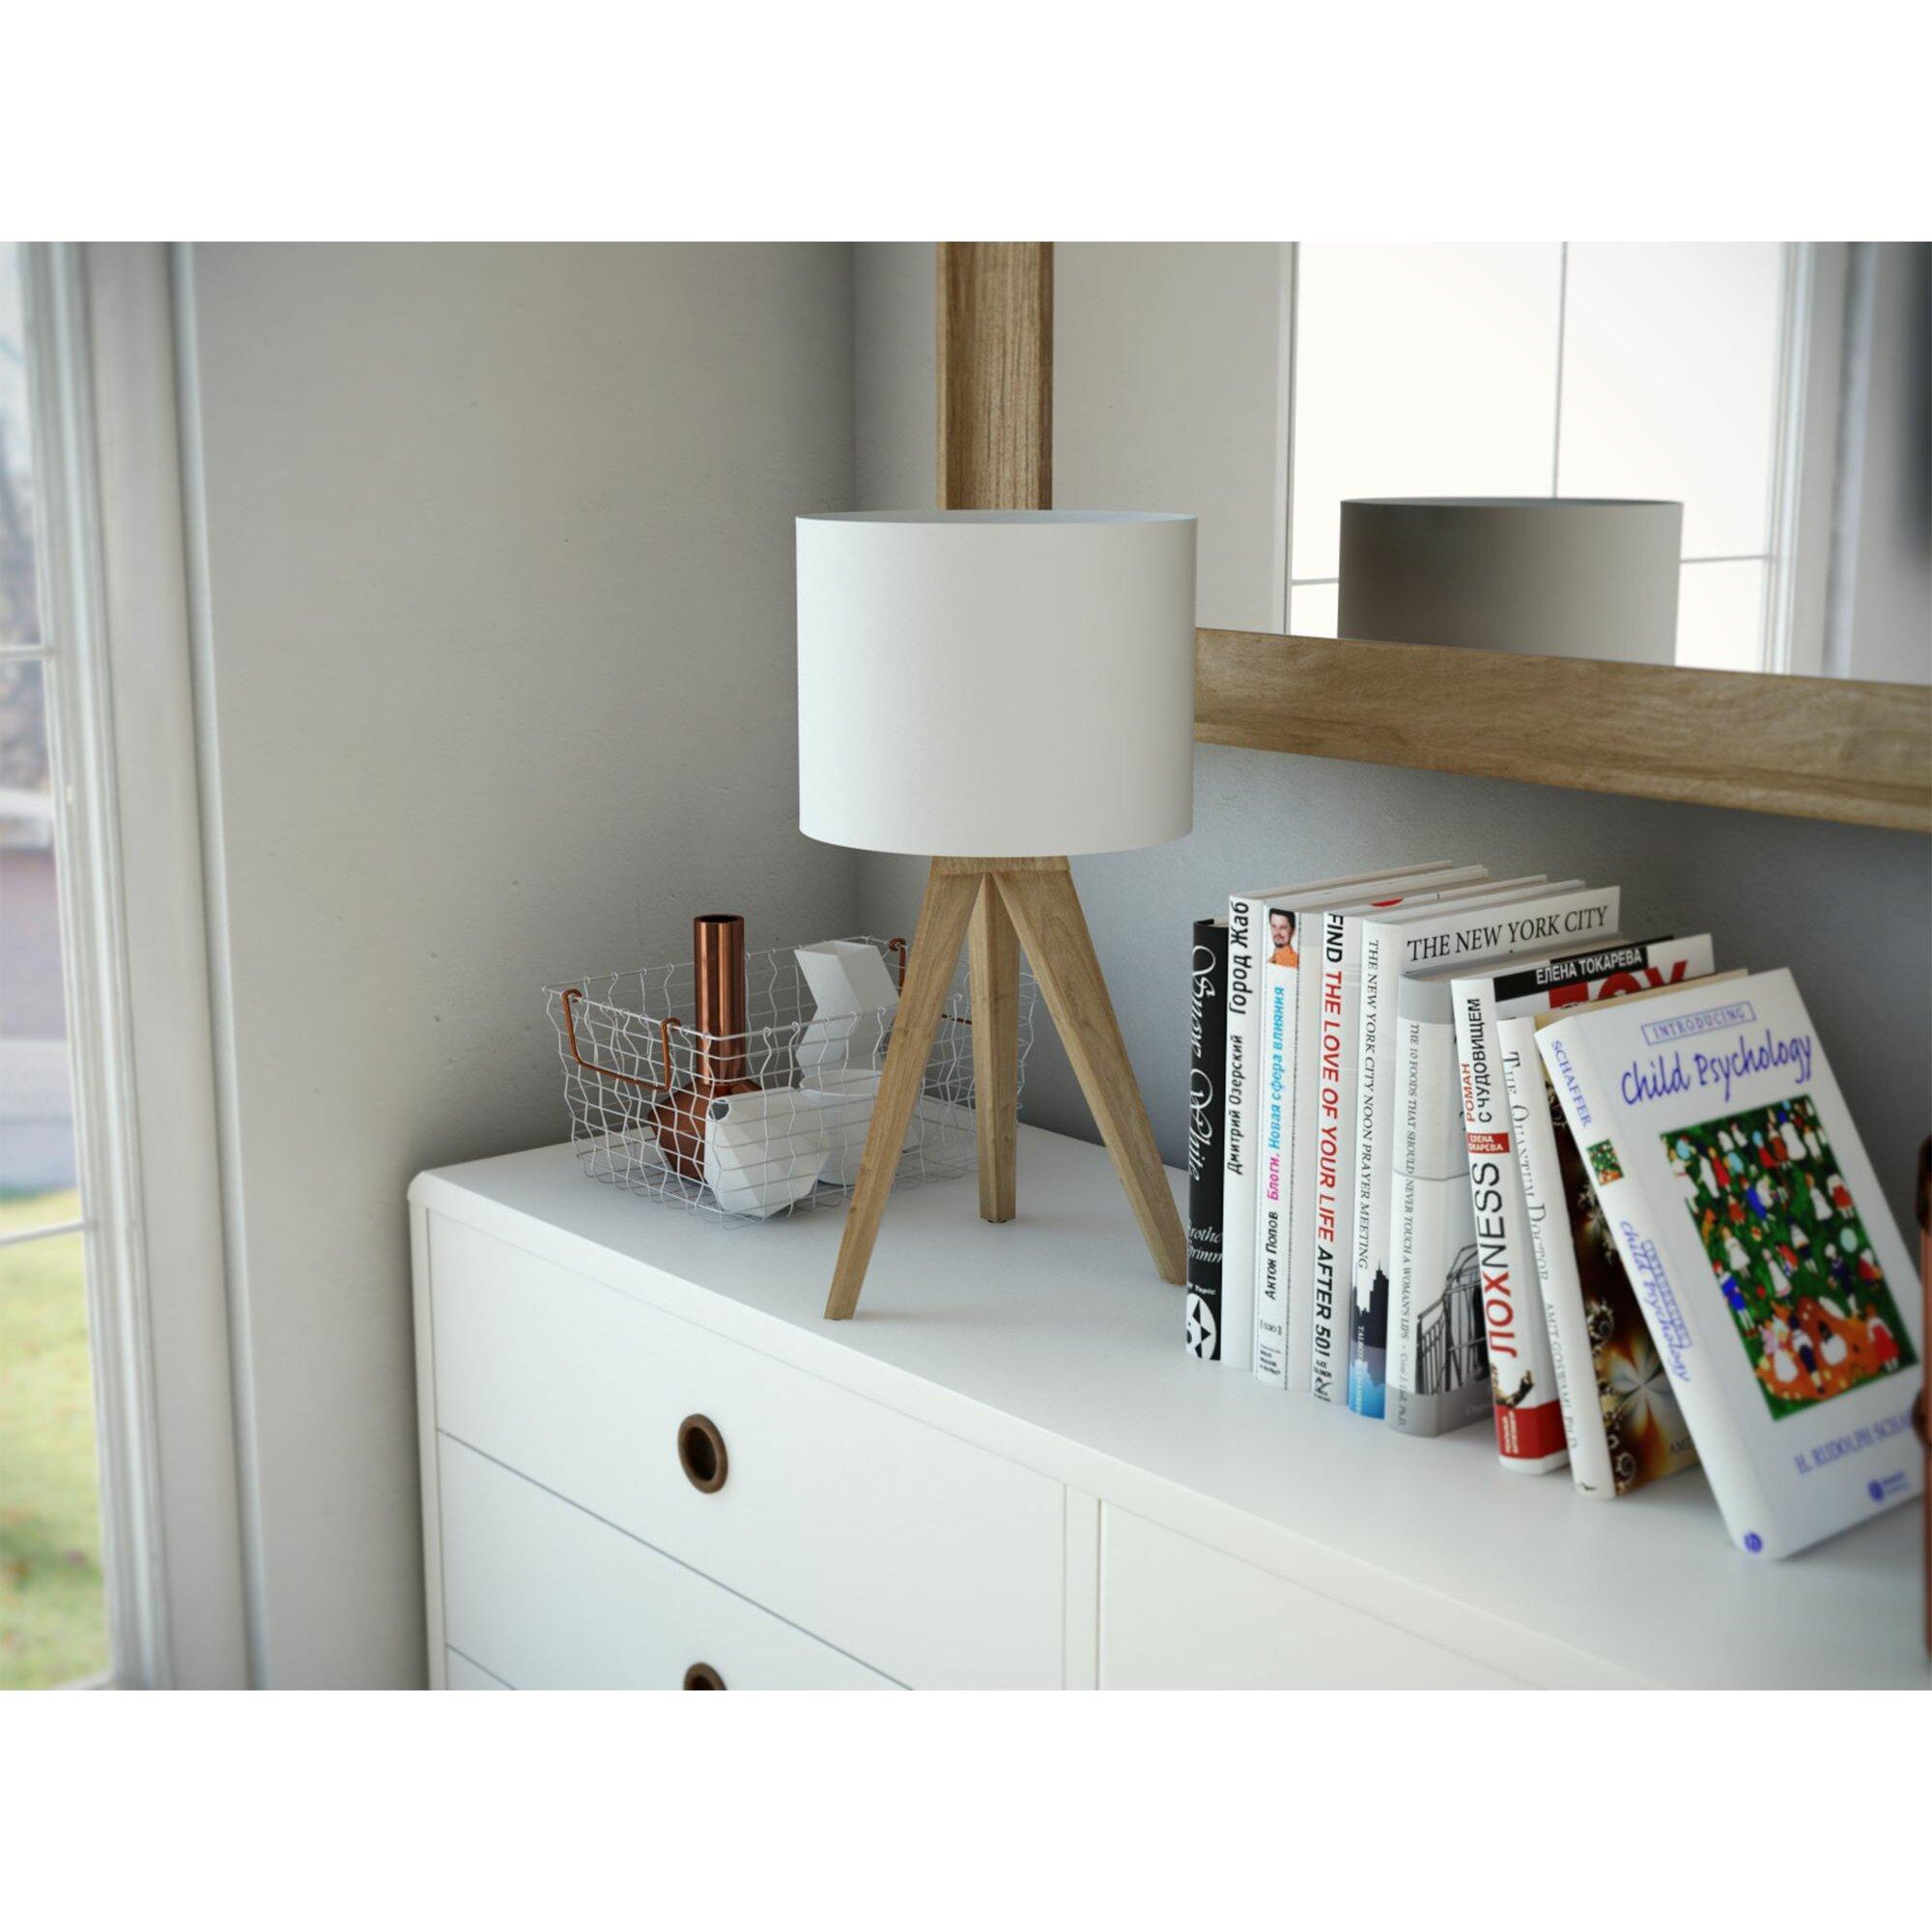 kullen badezimmermöbel 5-tlg – edgetags, Badezimmer ideen